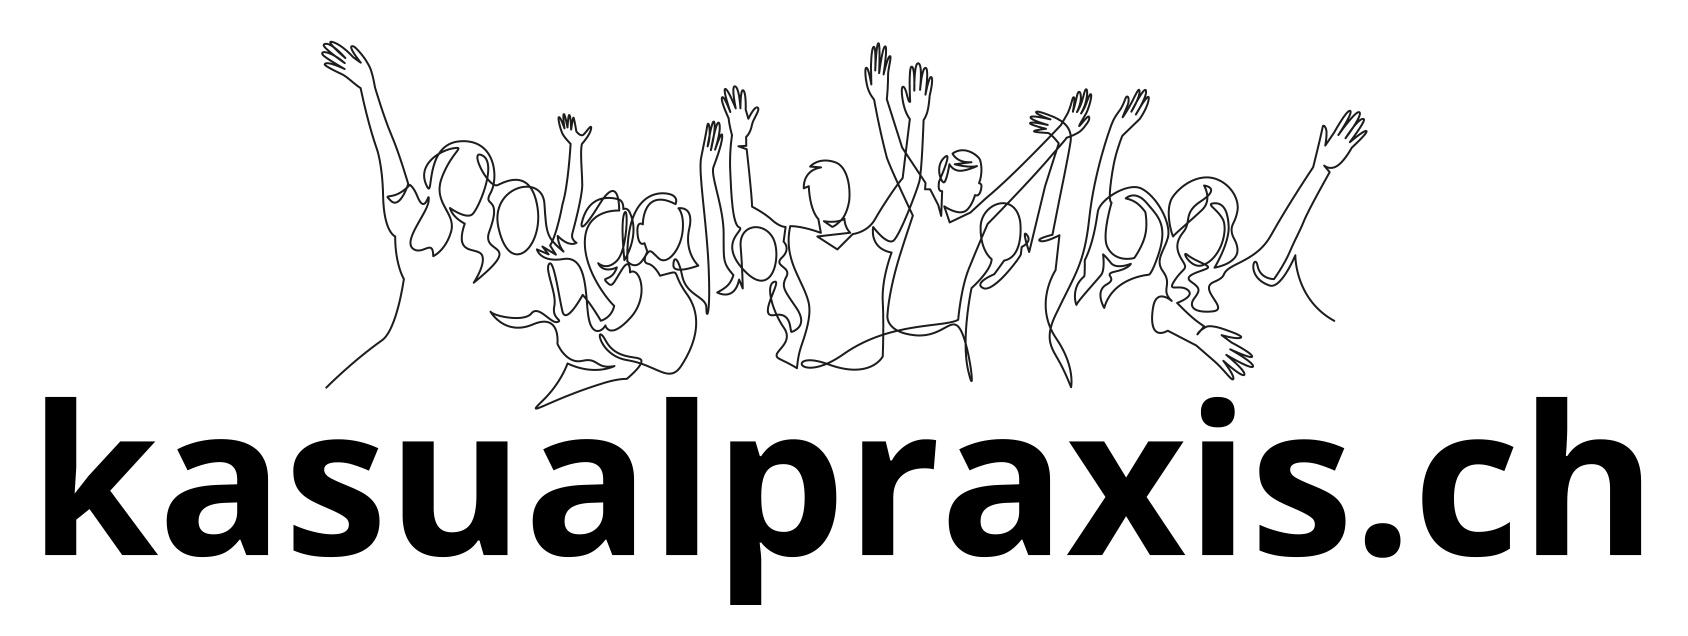 kasualpraxis.ch